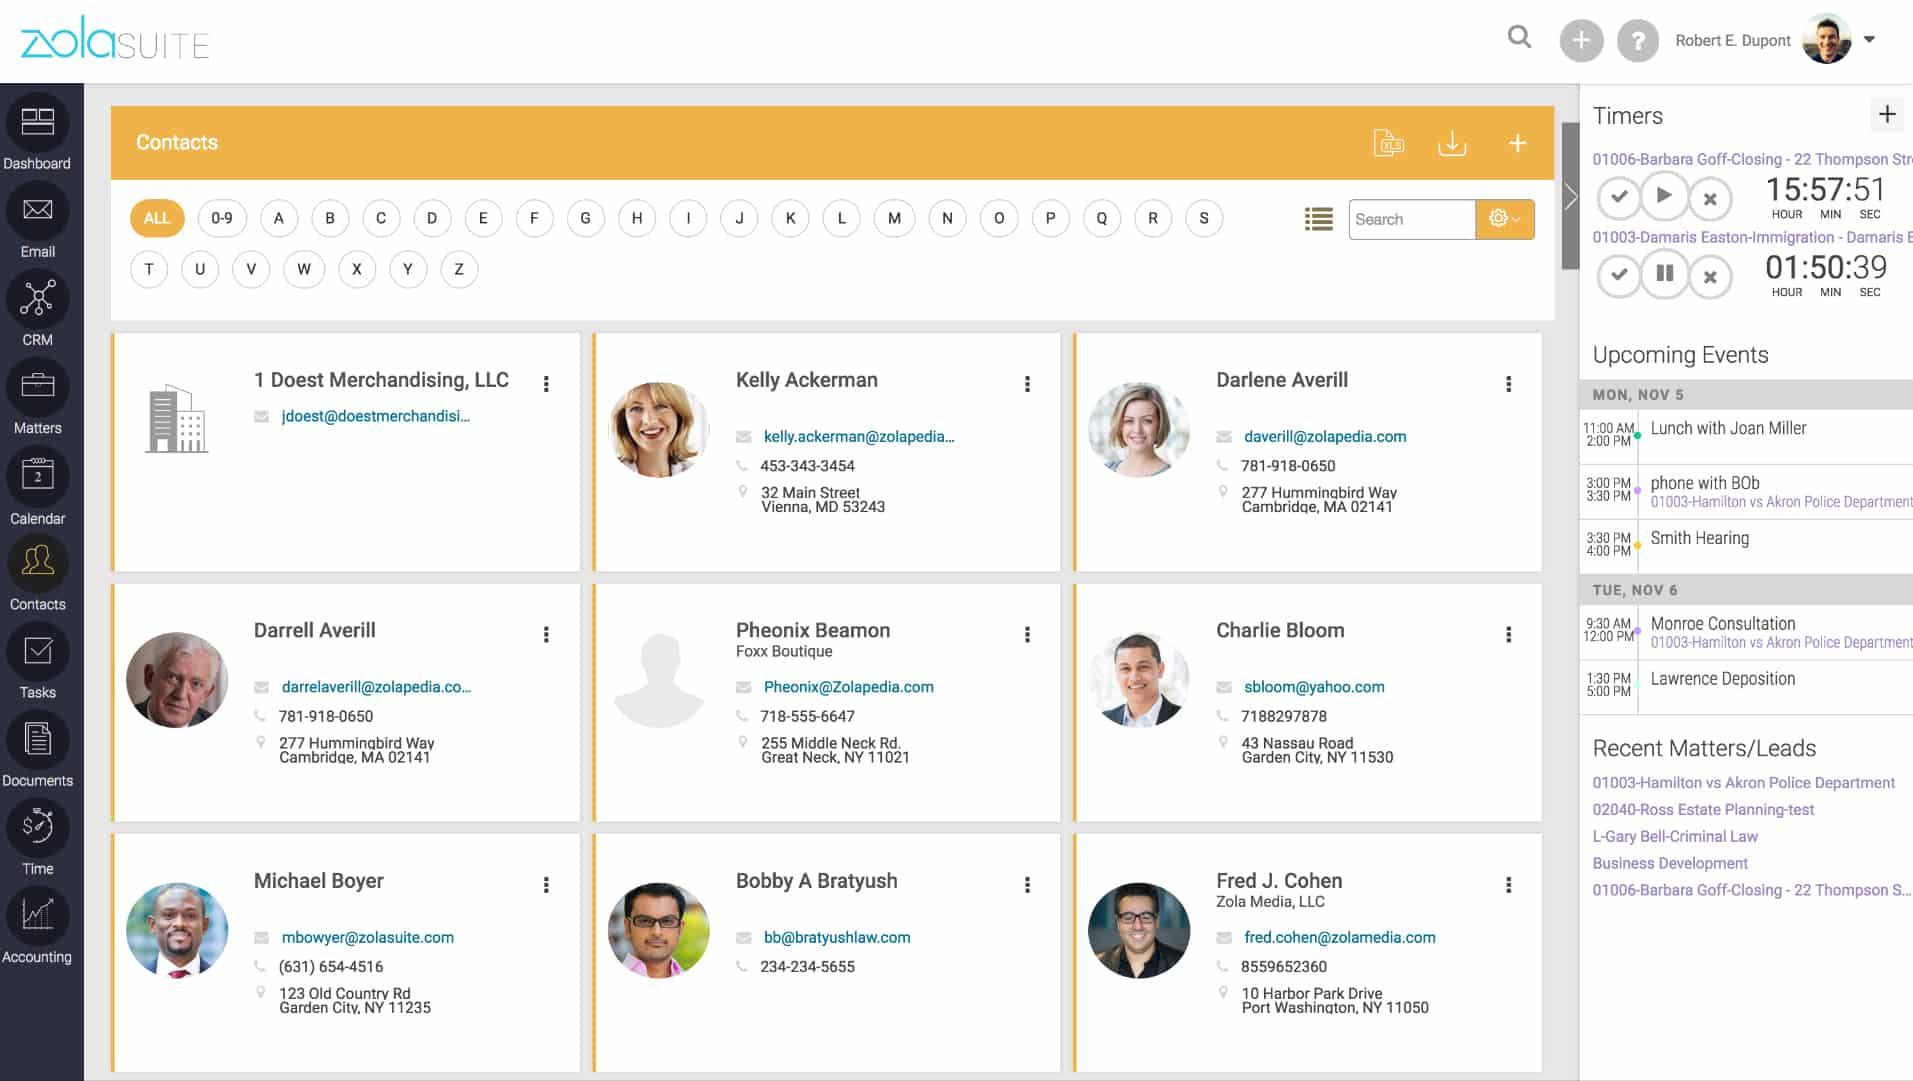 Screenshot of Zola Suite Contact Management Module